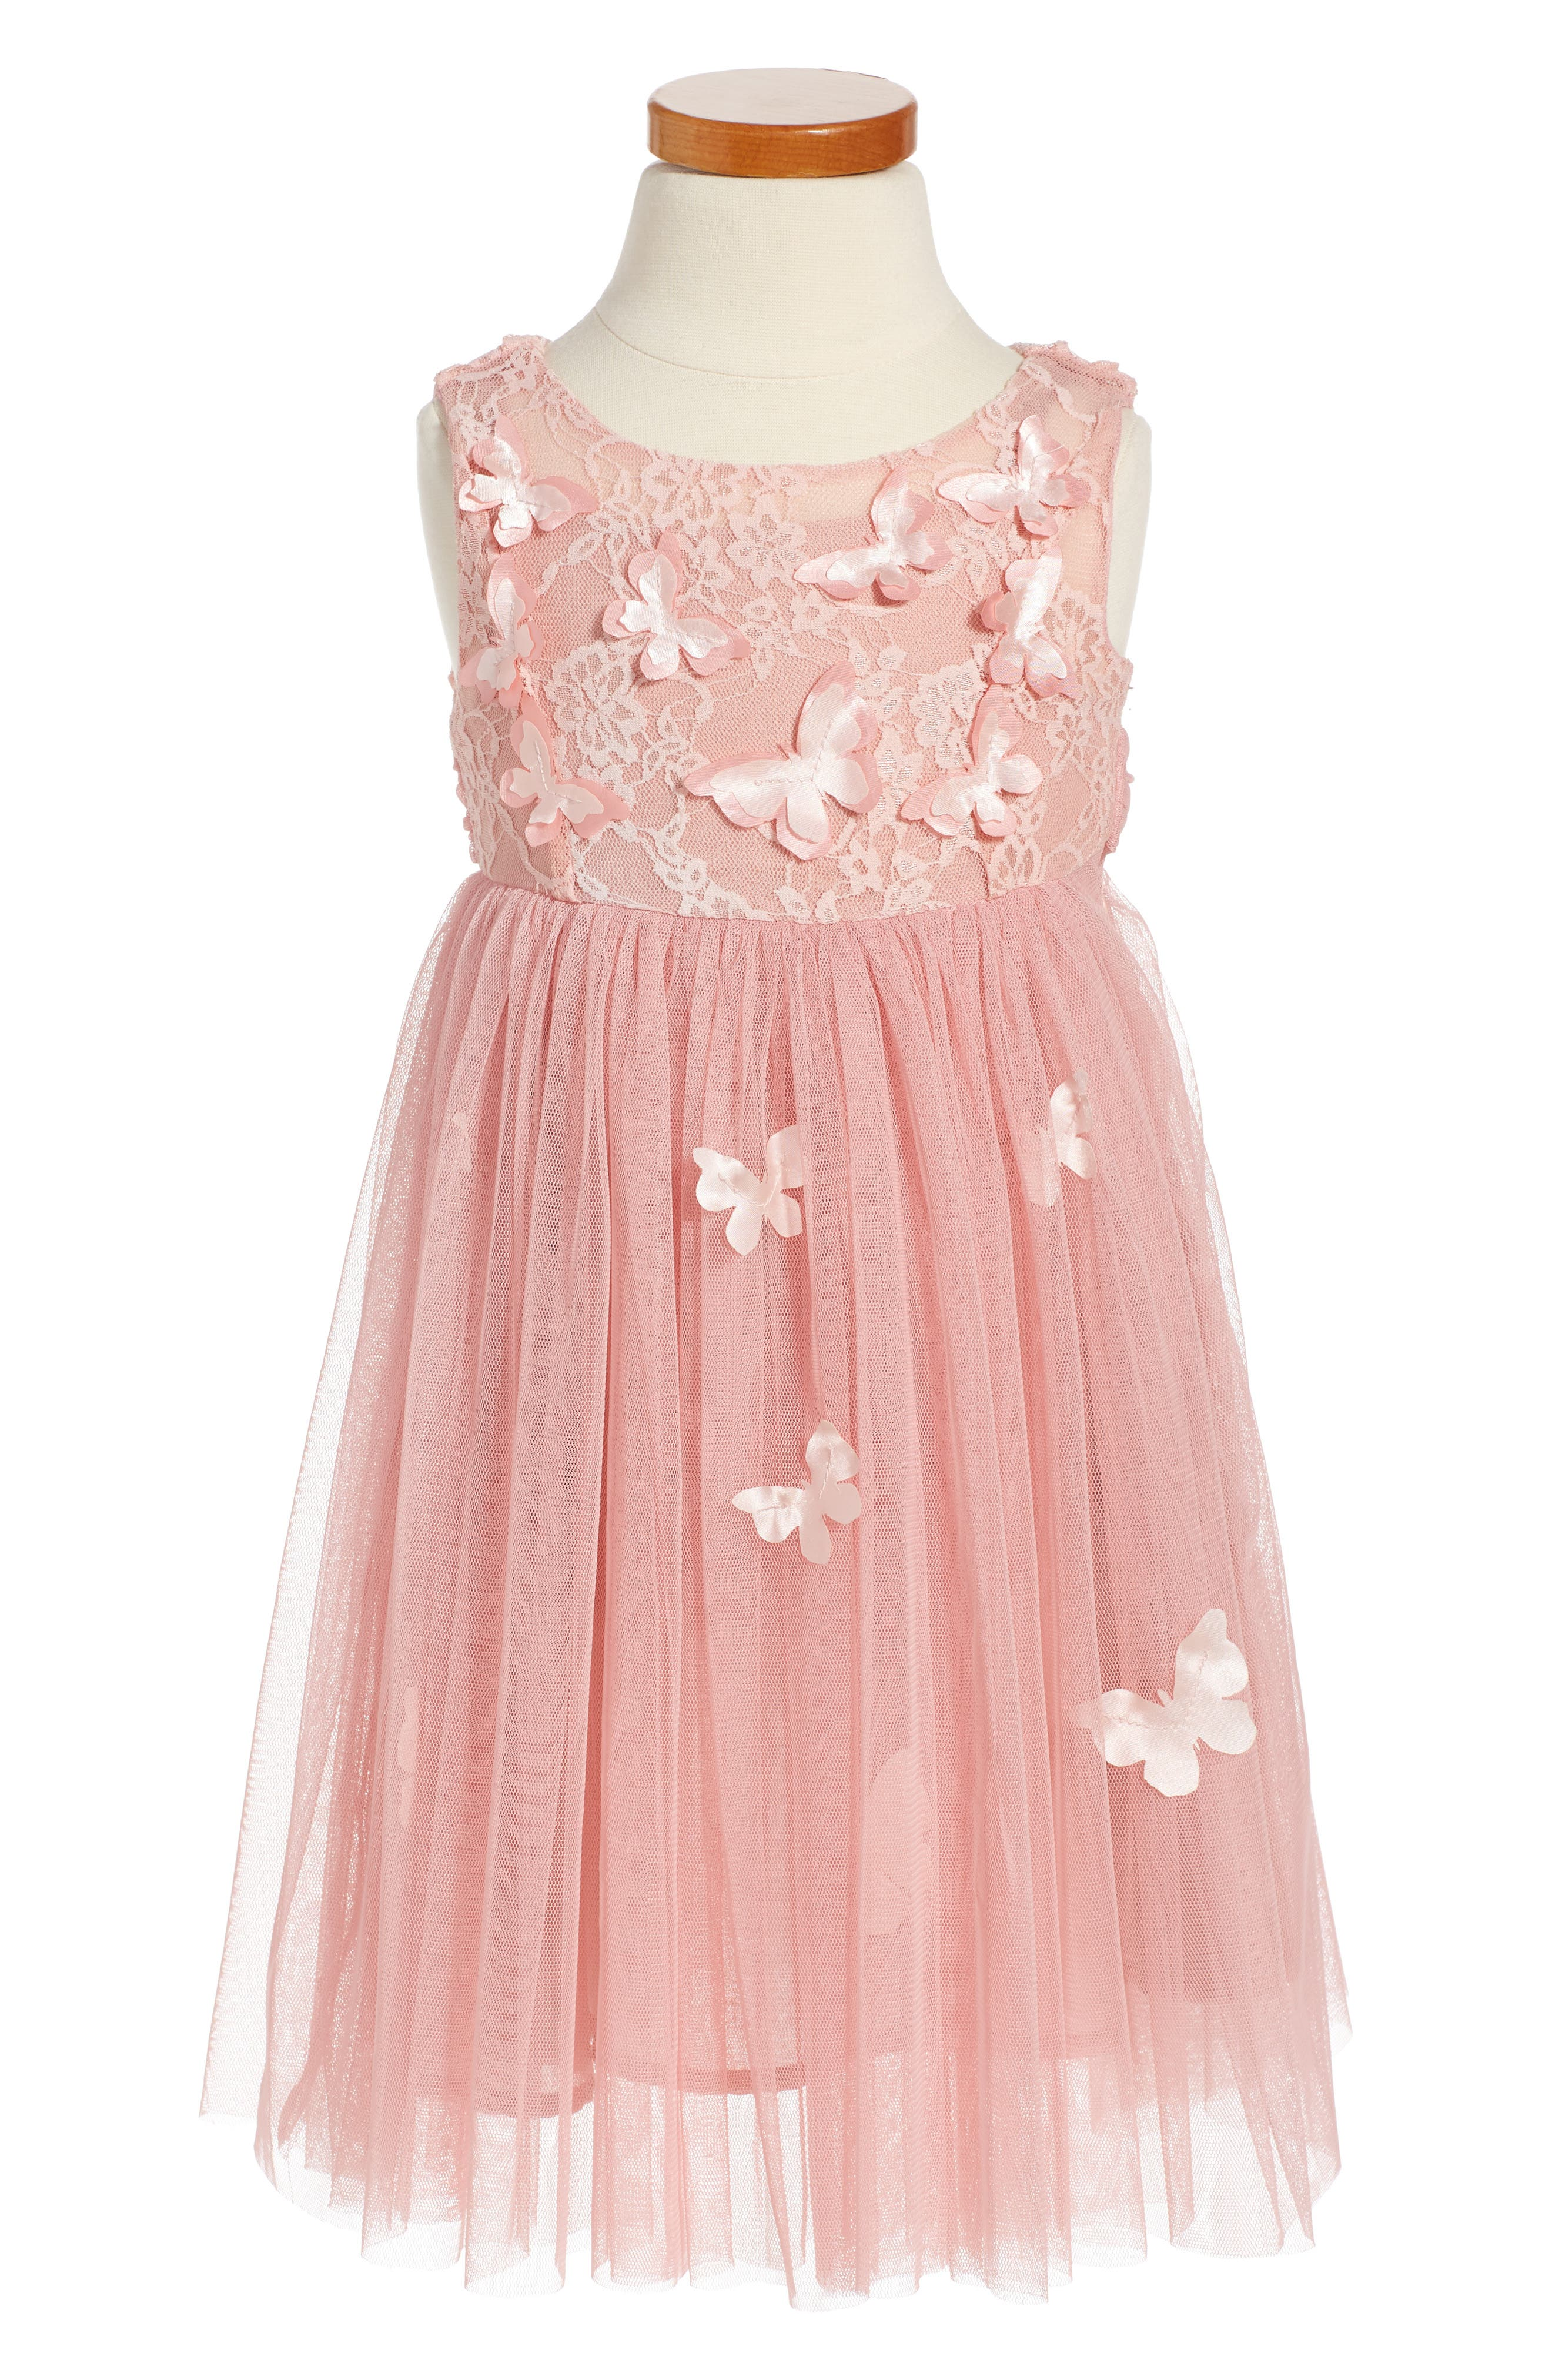 Butterfly Sleeveless Dress,                             Main thumbnail 1, color,                             653